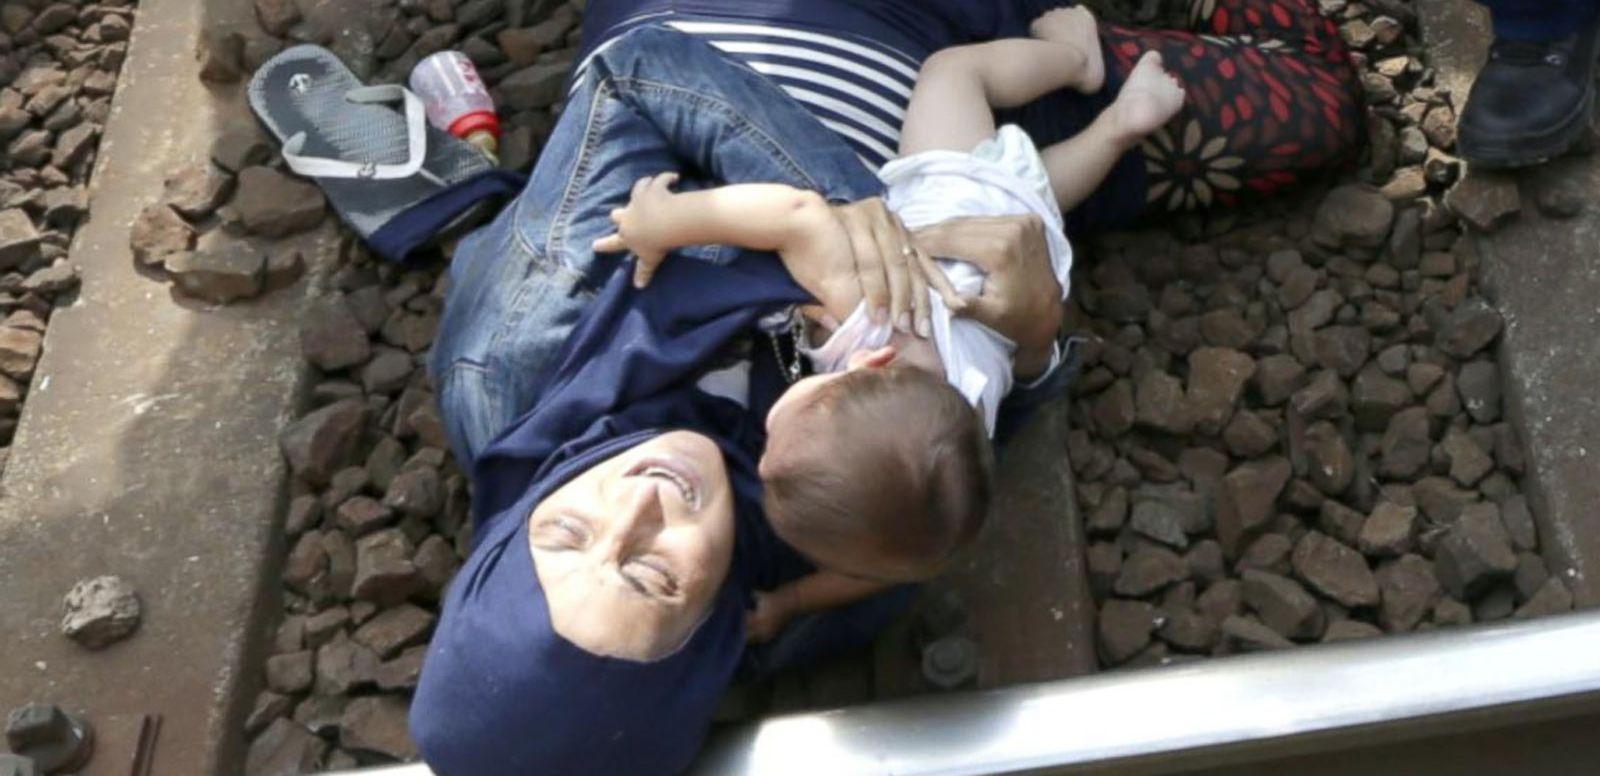 VIDEO: Syrian Refugees Face Tense Standoff Seeking Better Lives in Europe